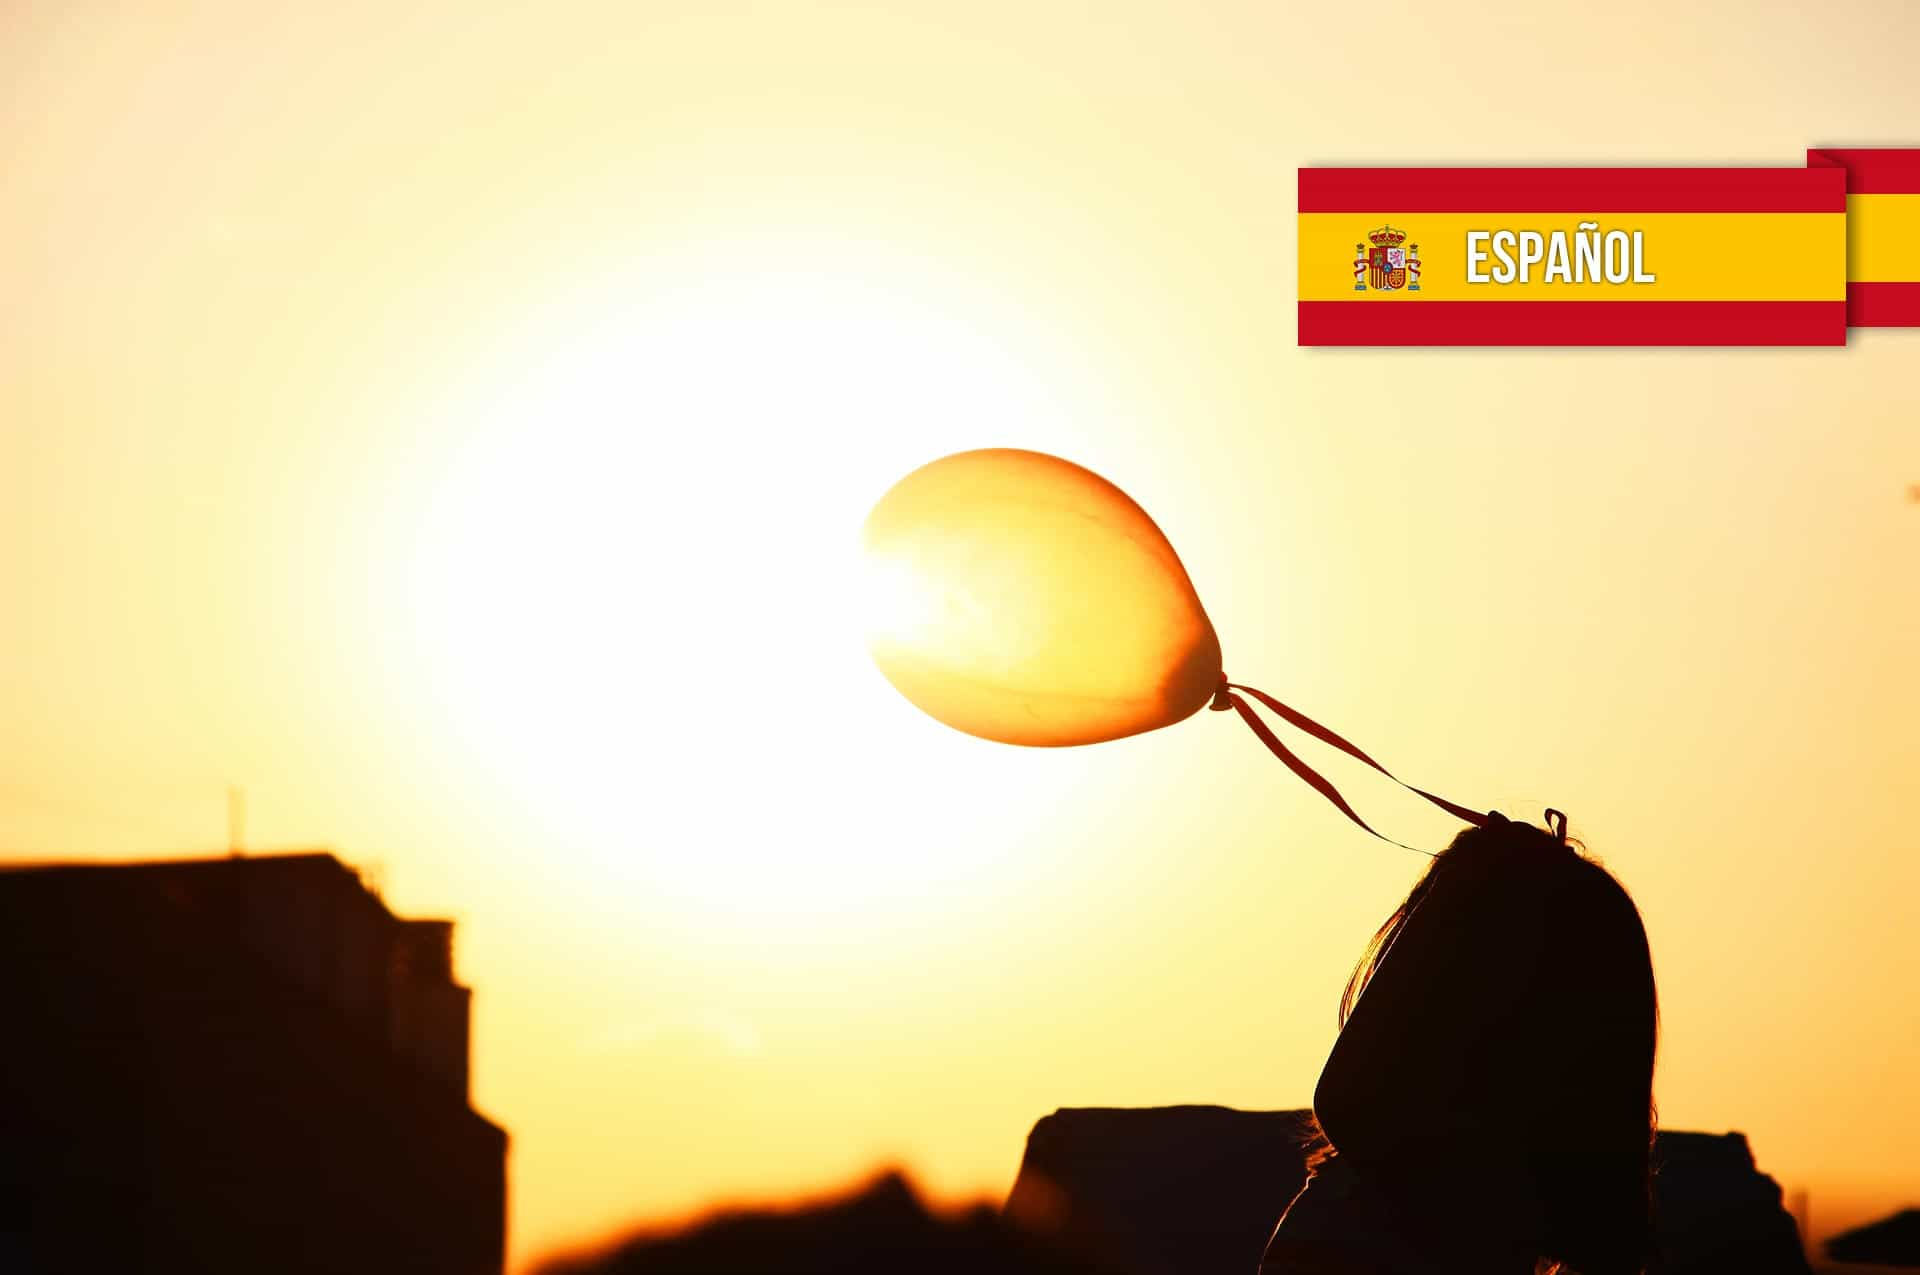 Referencia de Gratitud – Spanish